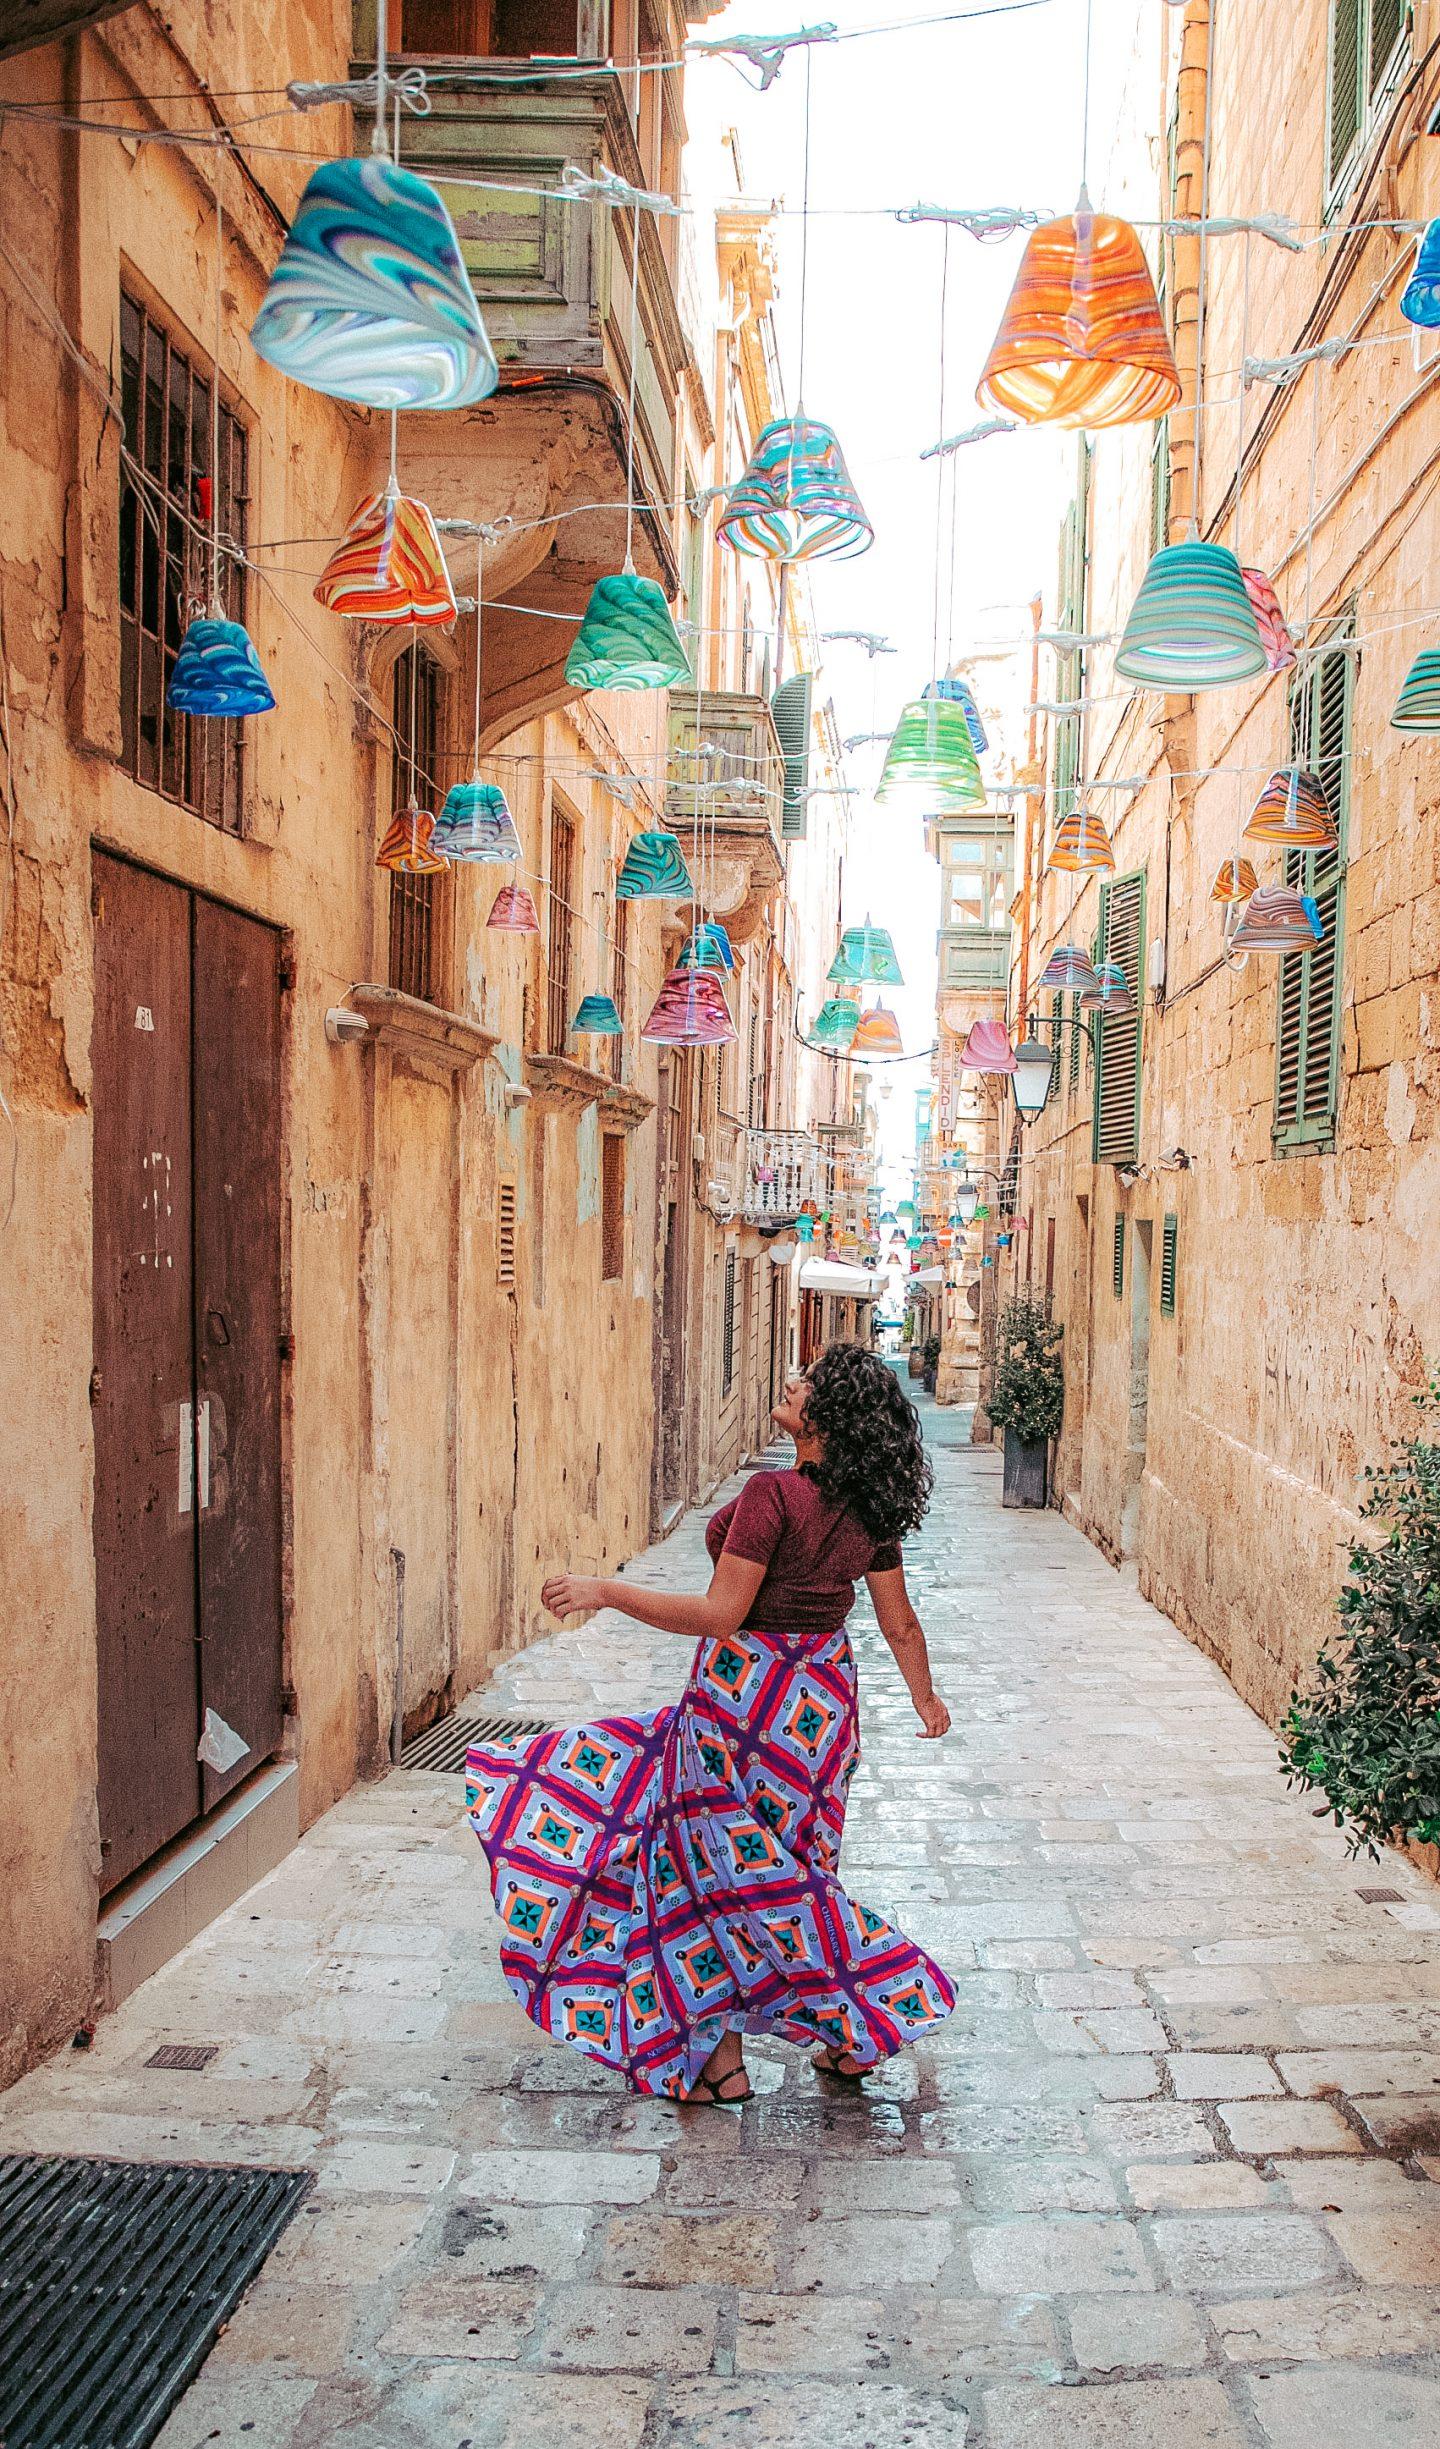 instagrammable-spots-valletta-strait-street-malta